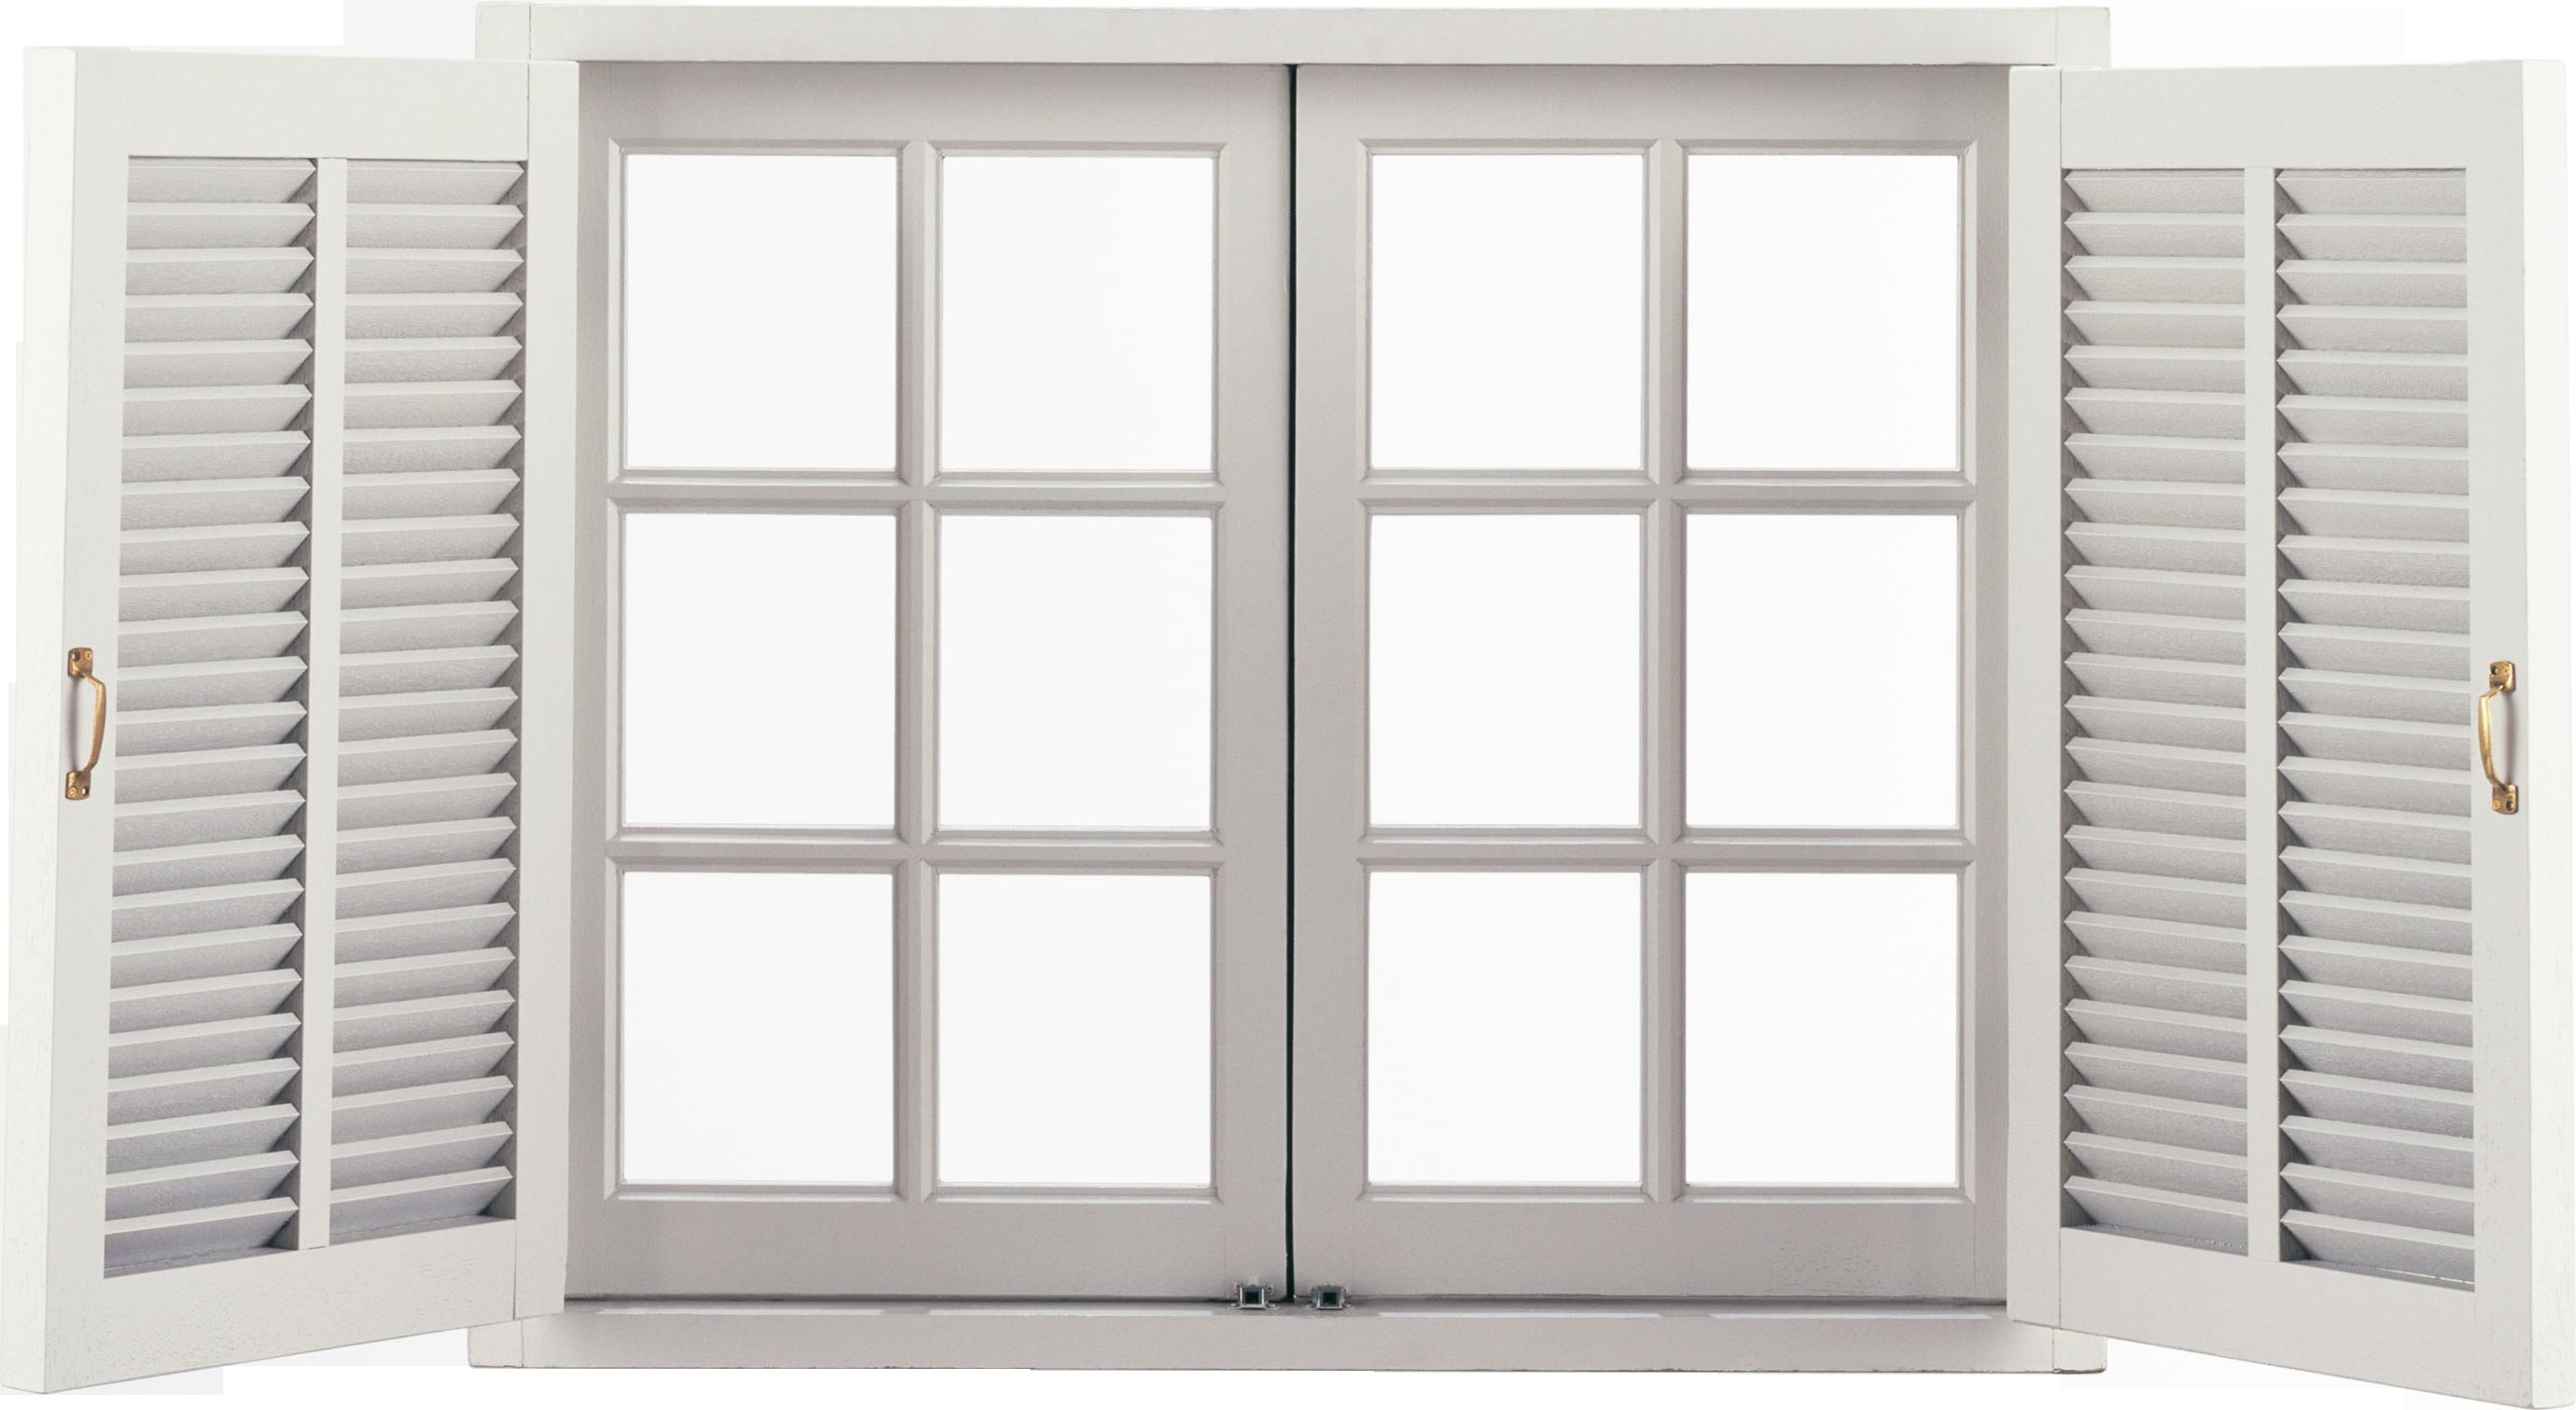 Window Decoracao De Casa Decoracao Casas